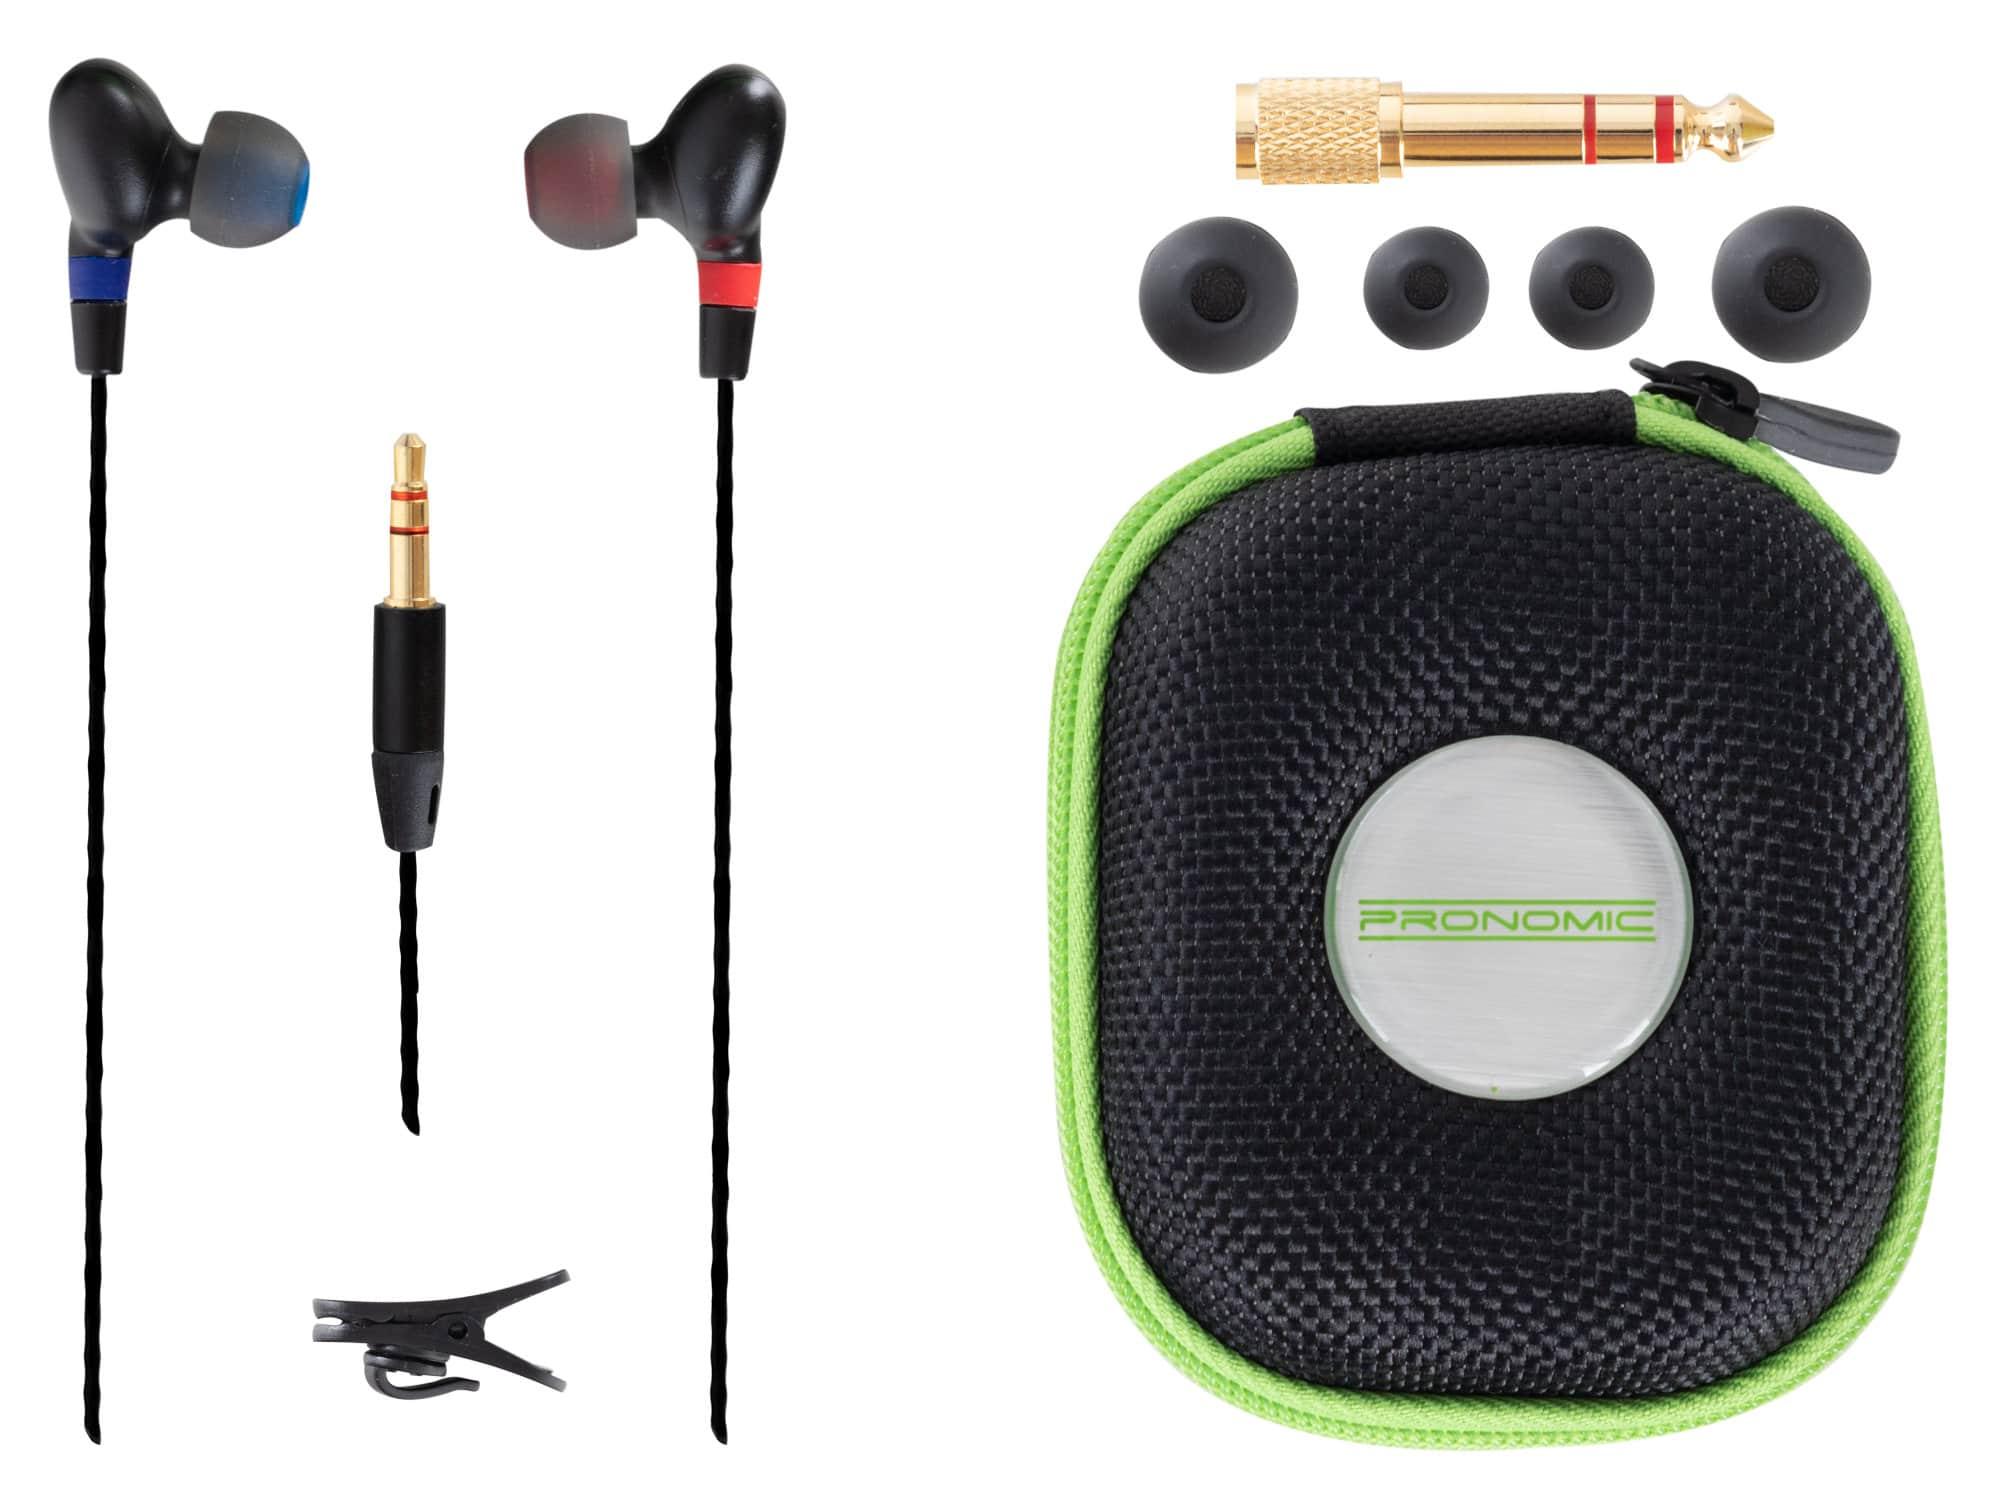 Kopfhoerer - Pronomic iPH 125 In Ear Kopfhörer 2,5m - Onlineshop Musikhaus Kirstein